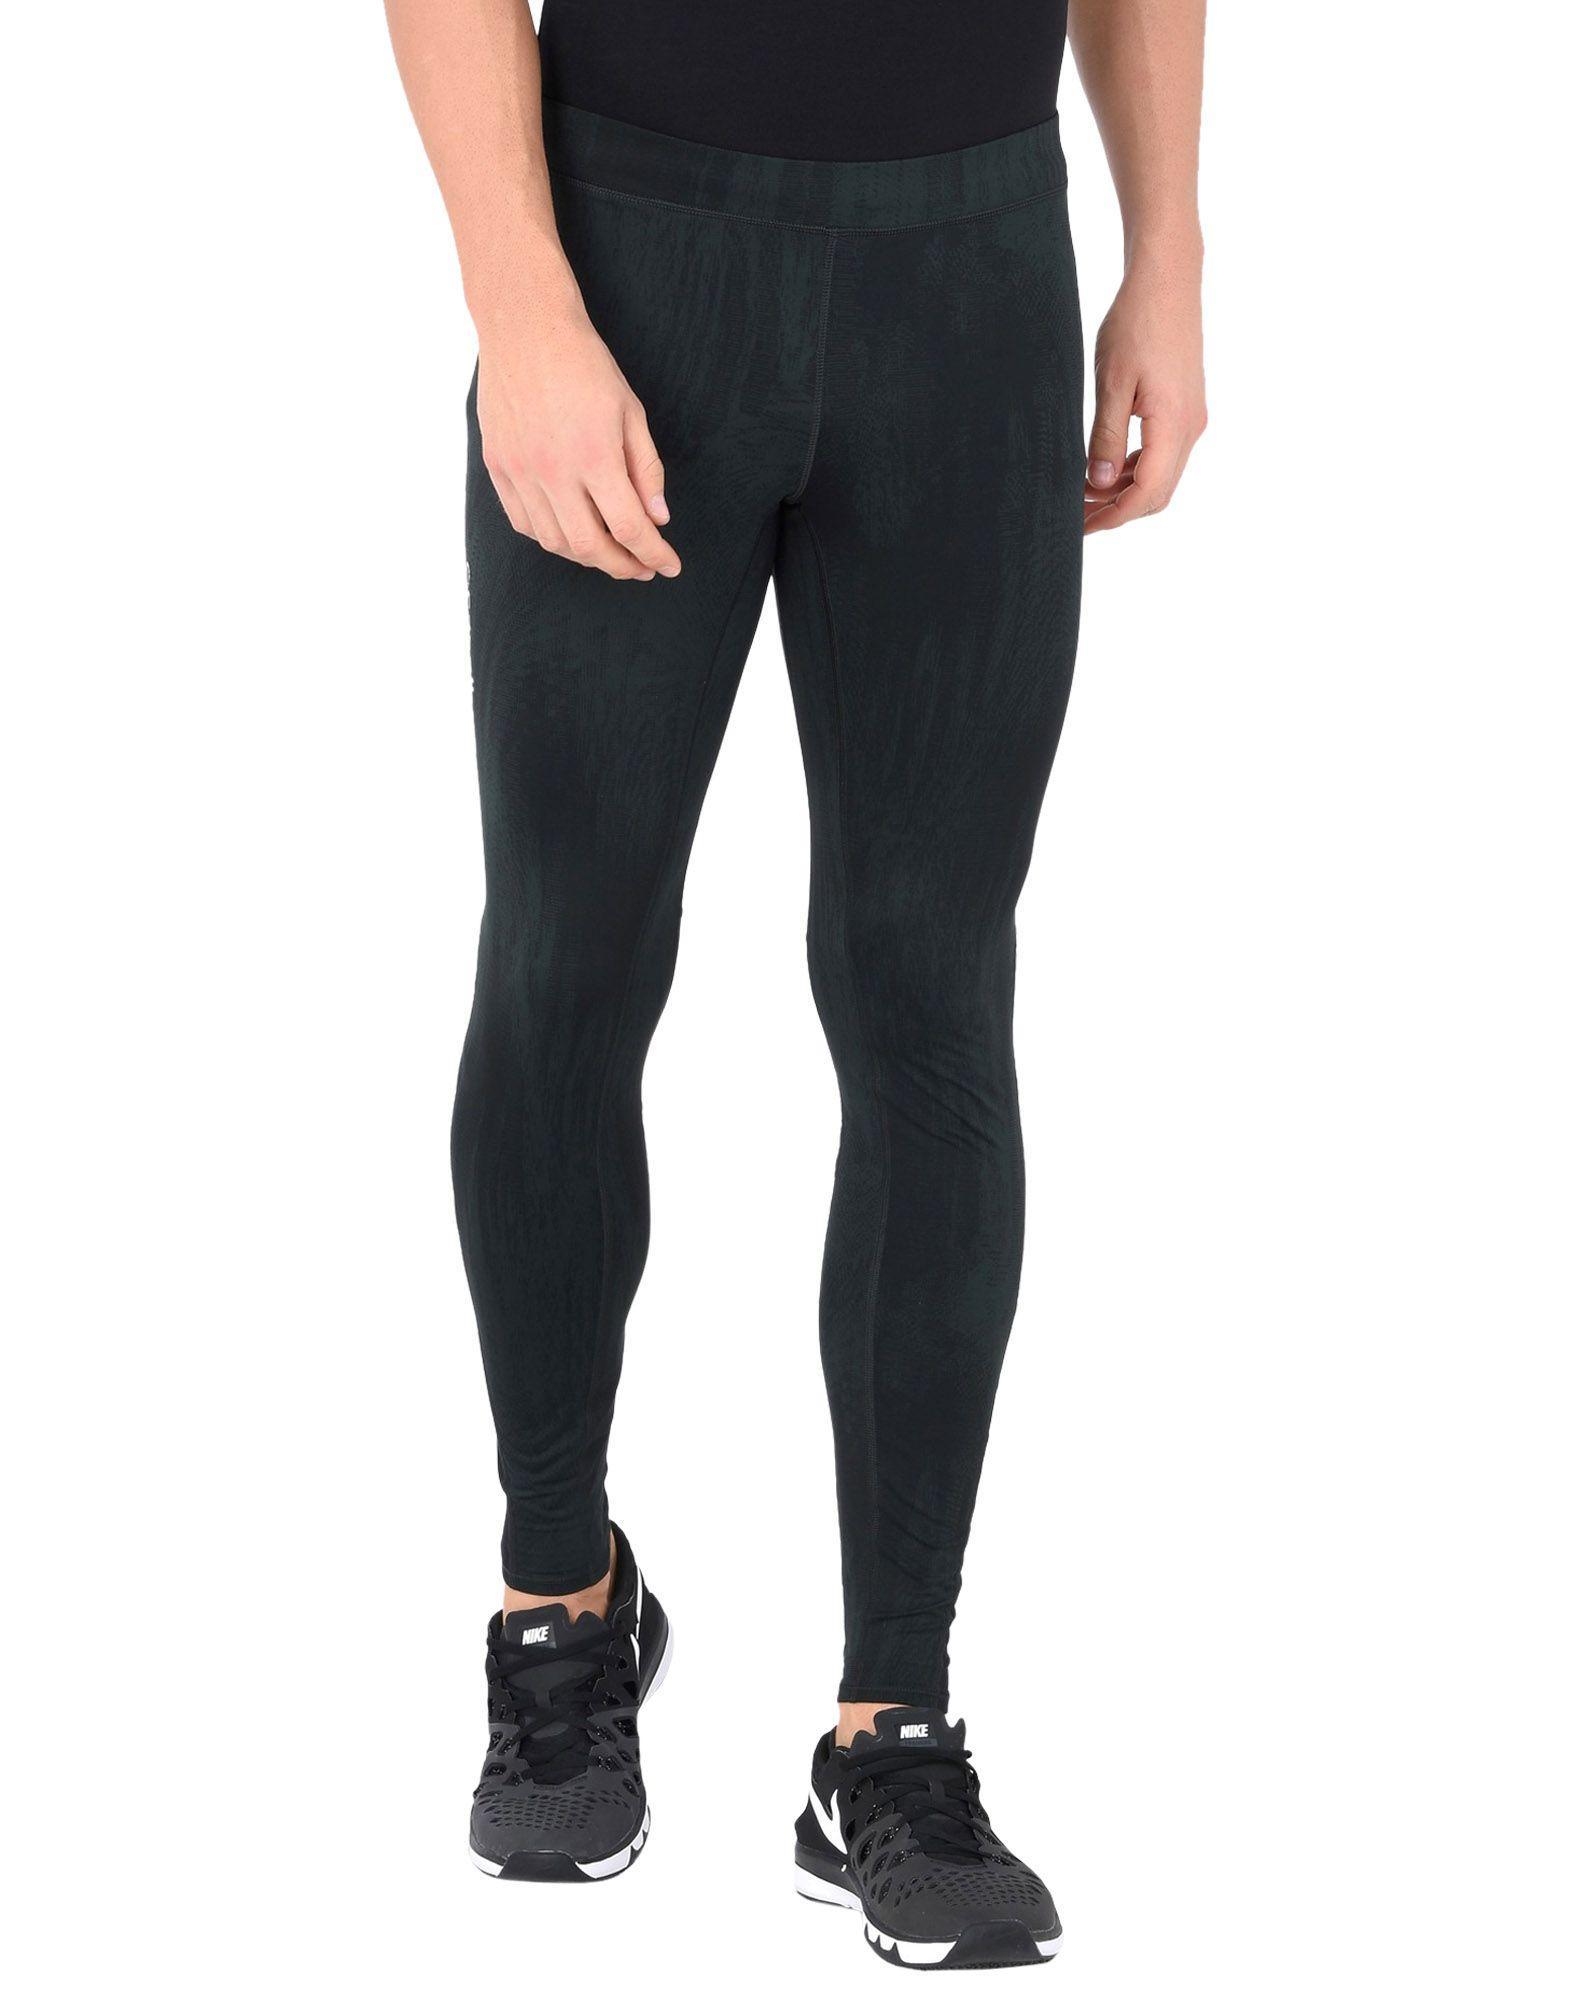 Casall Athletic Pant In Dark Green